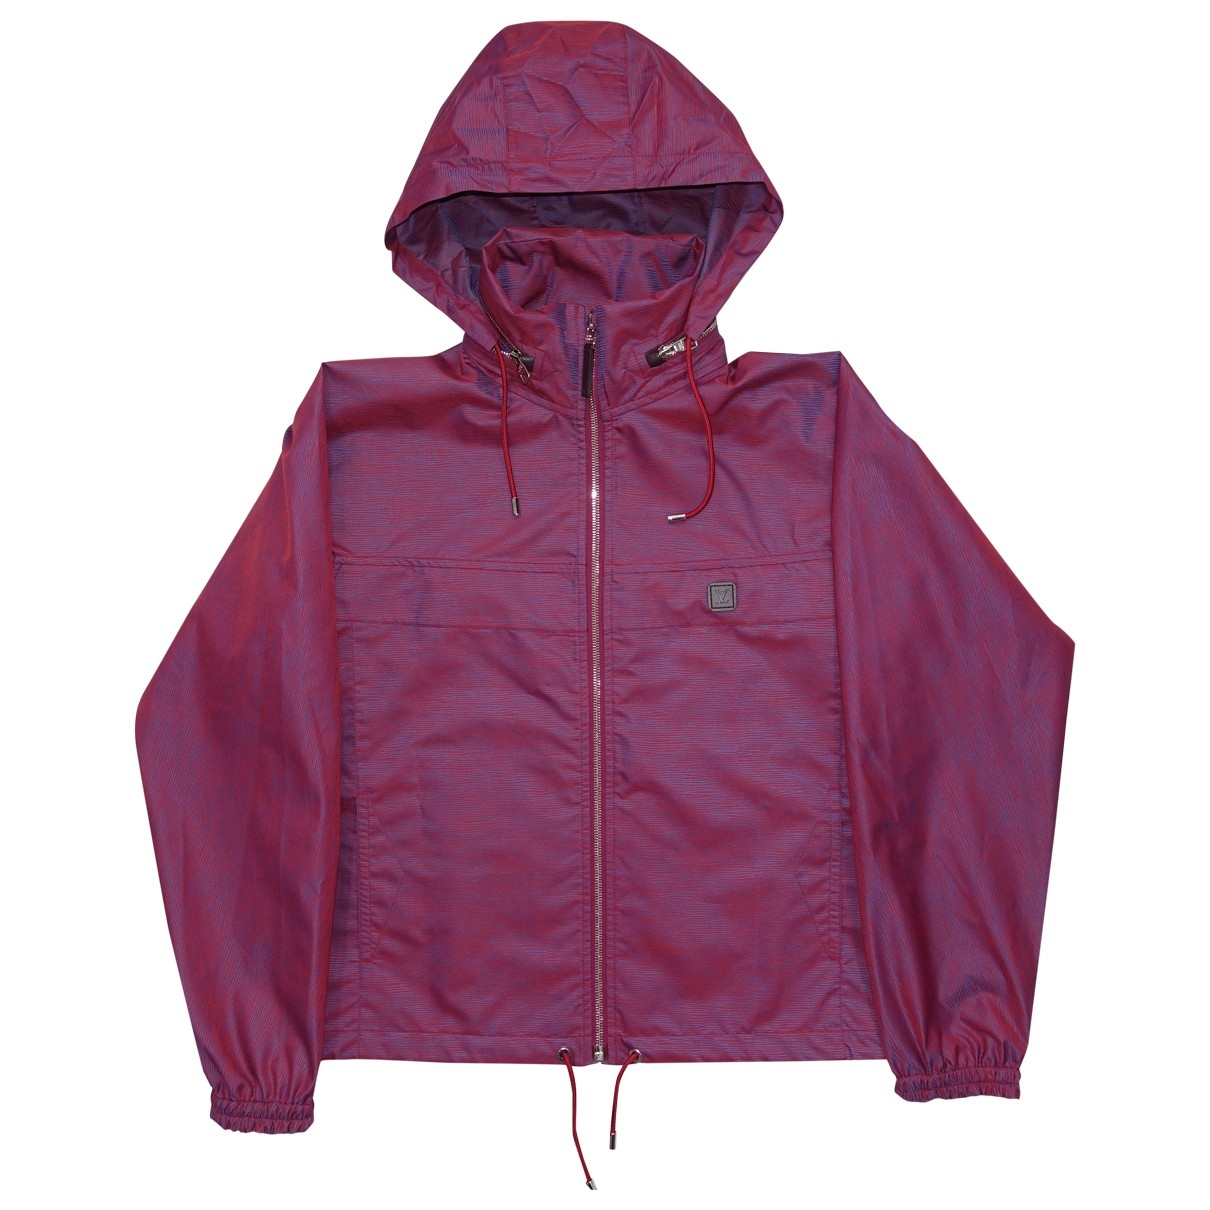 Louis Vuitton \N Red jacket  for Men 46 FR